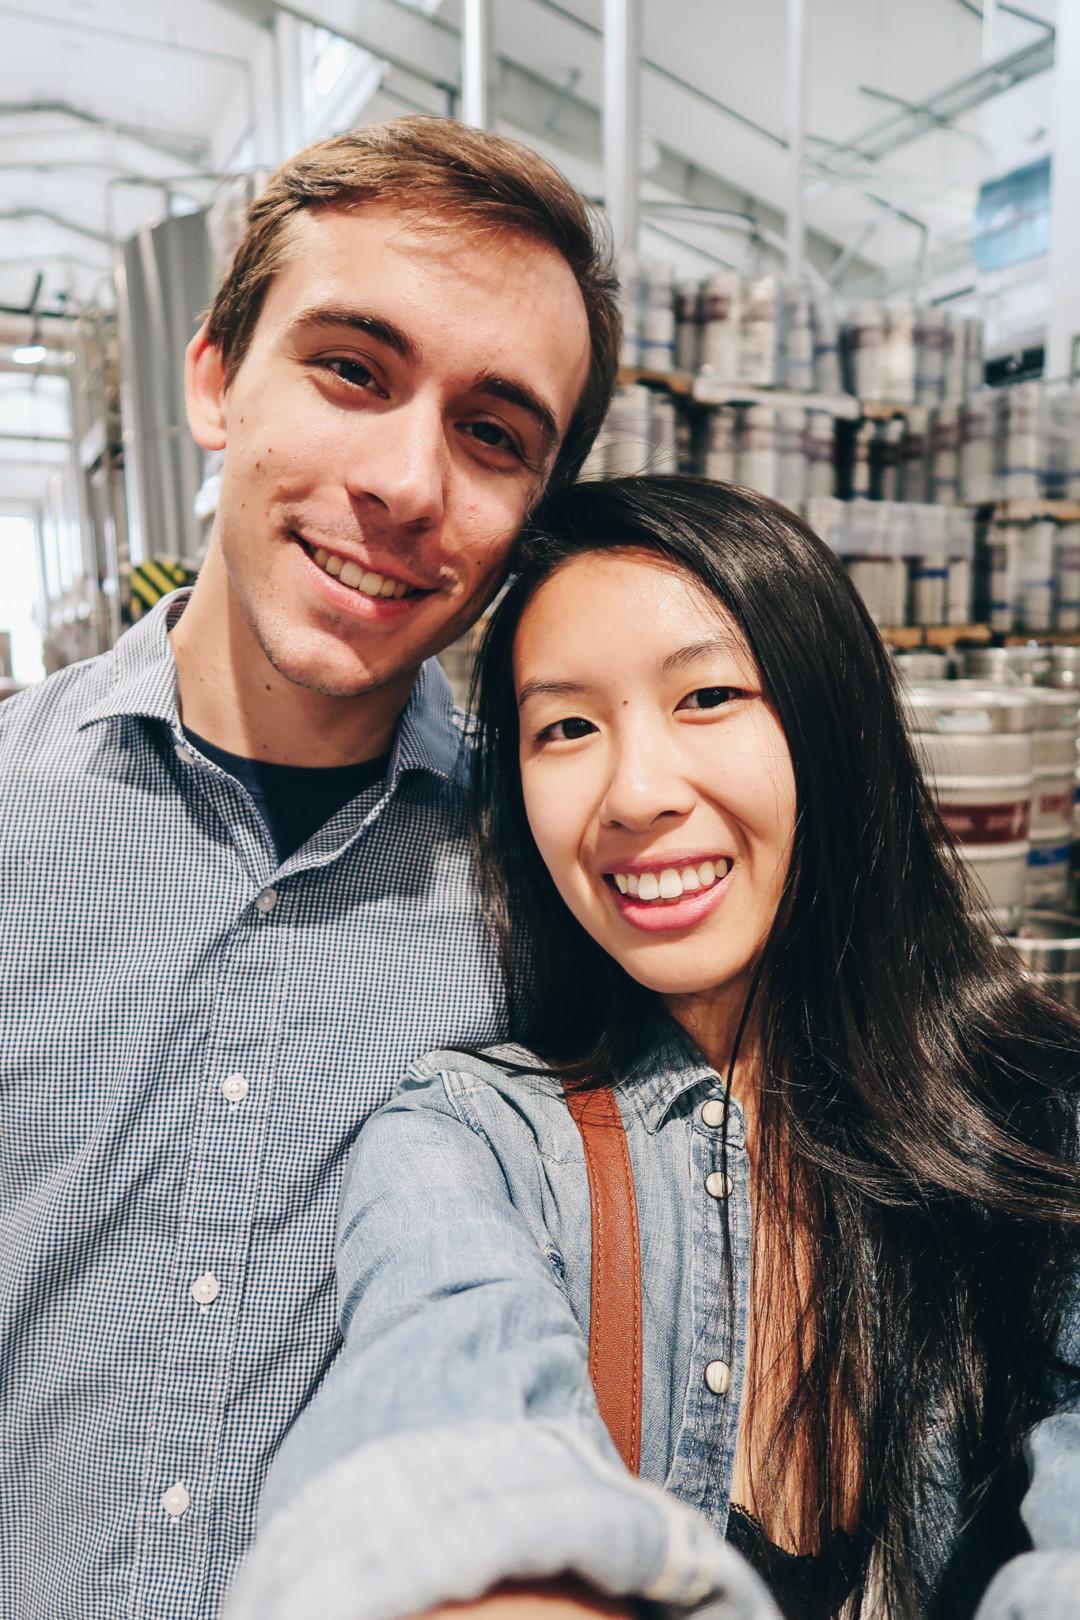 Kim and Dan touring Stony Creek Brewery, Branford, CT